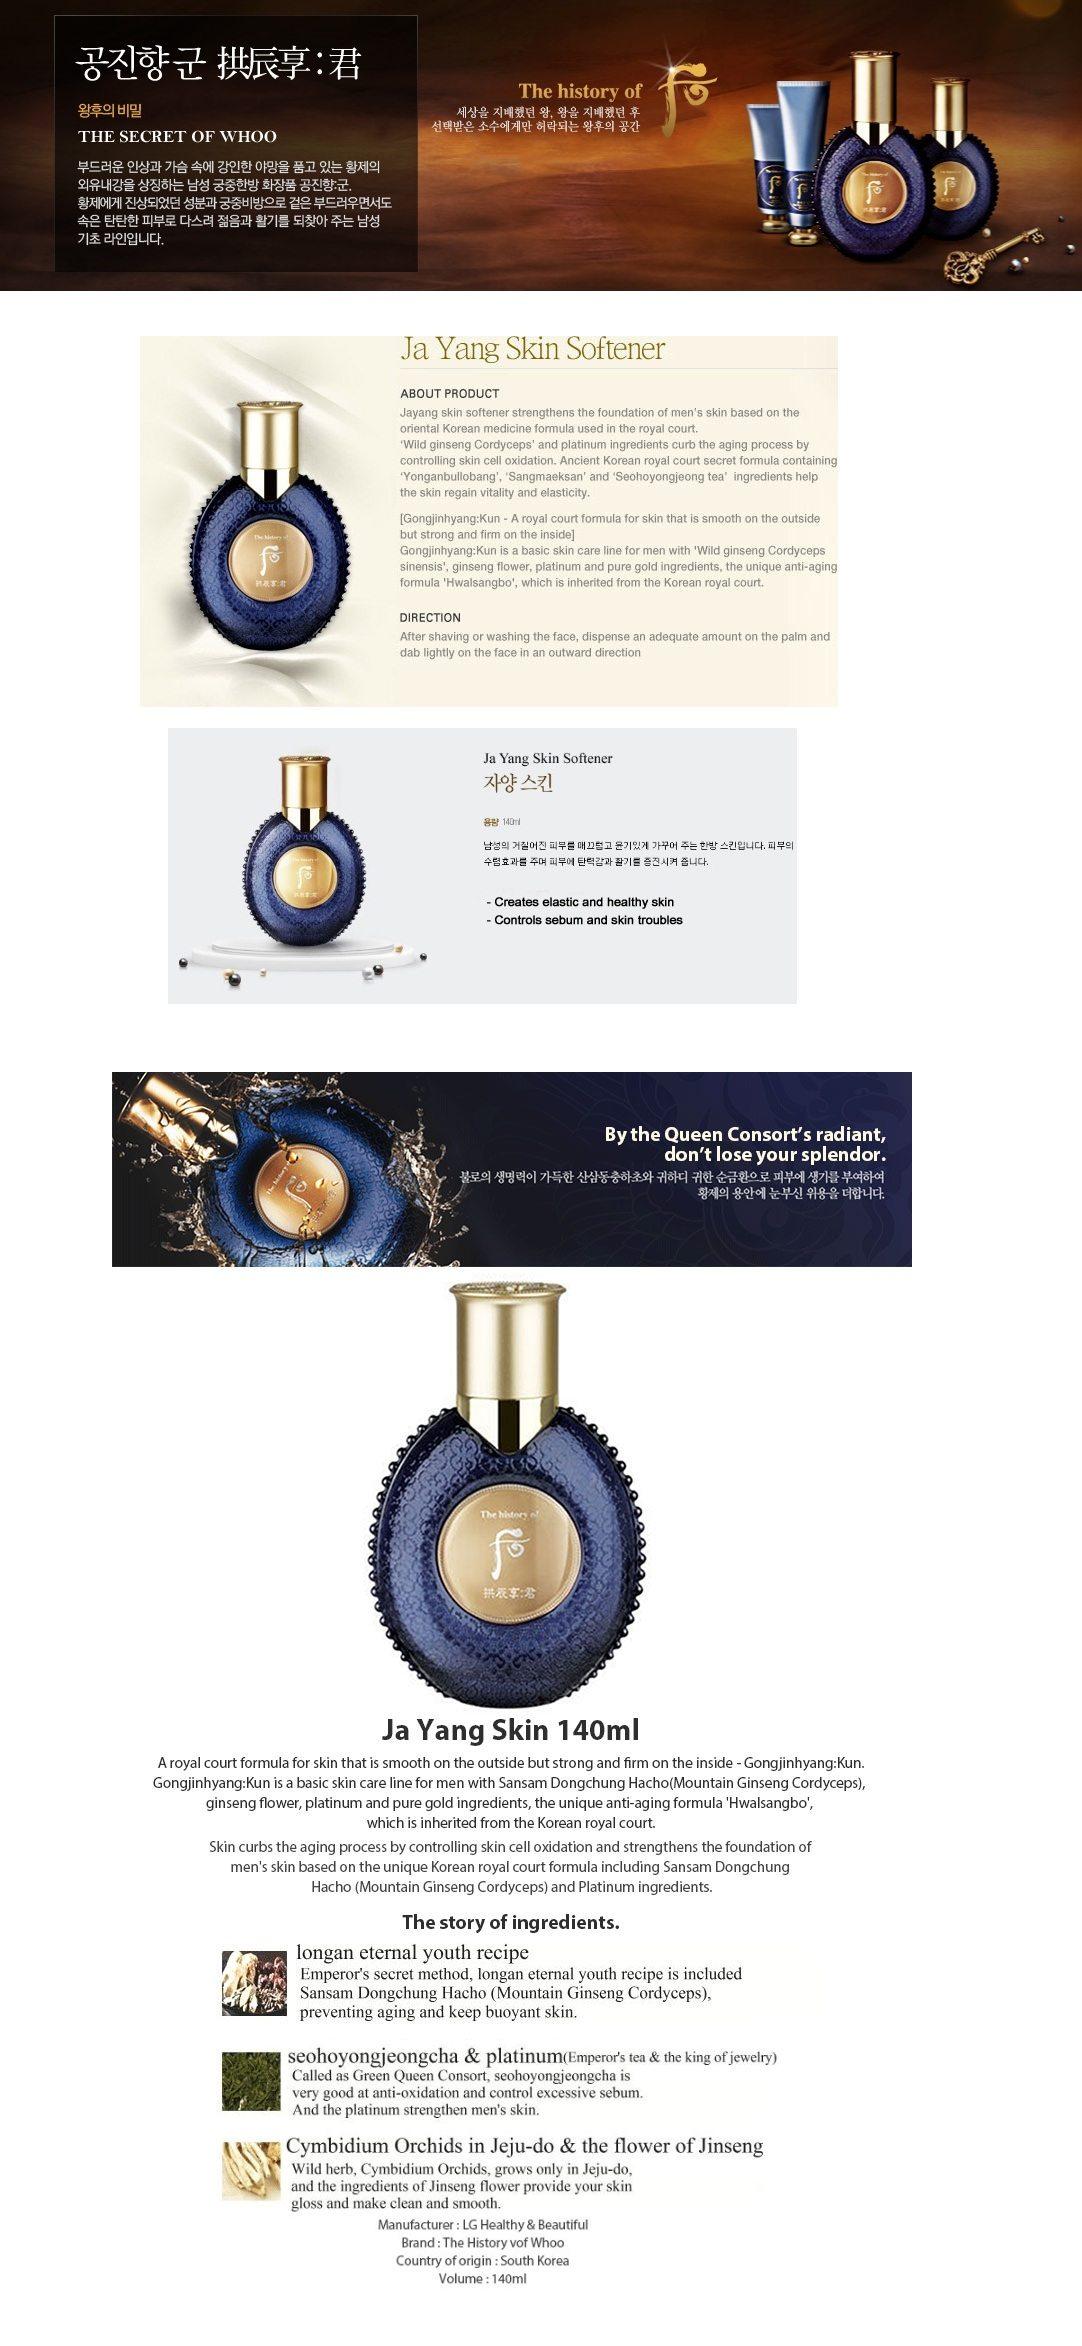 The History Of Whoo Gongjinhyang Gun Jayang Skin Softener korean cosmetic skincare product online shop malaysia france austria1